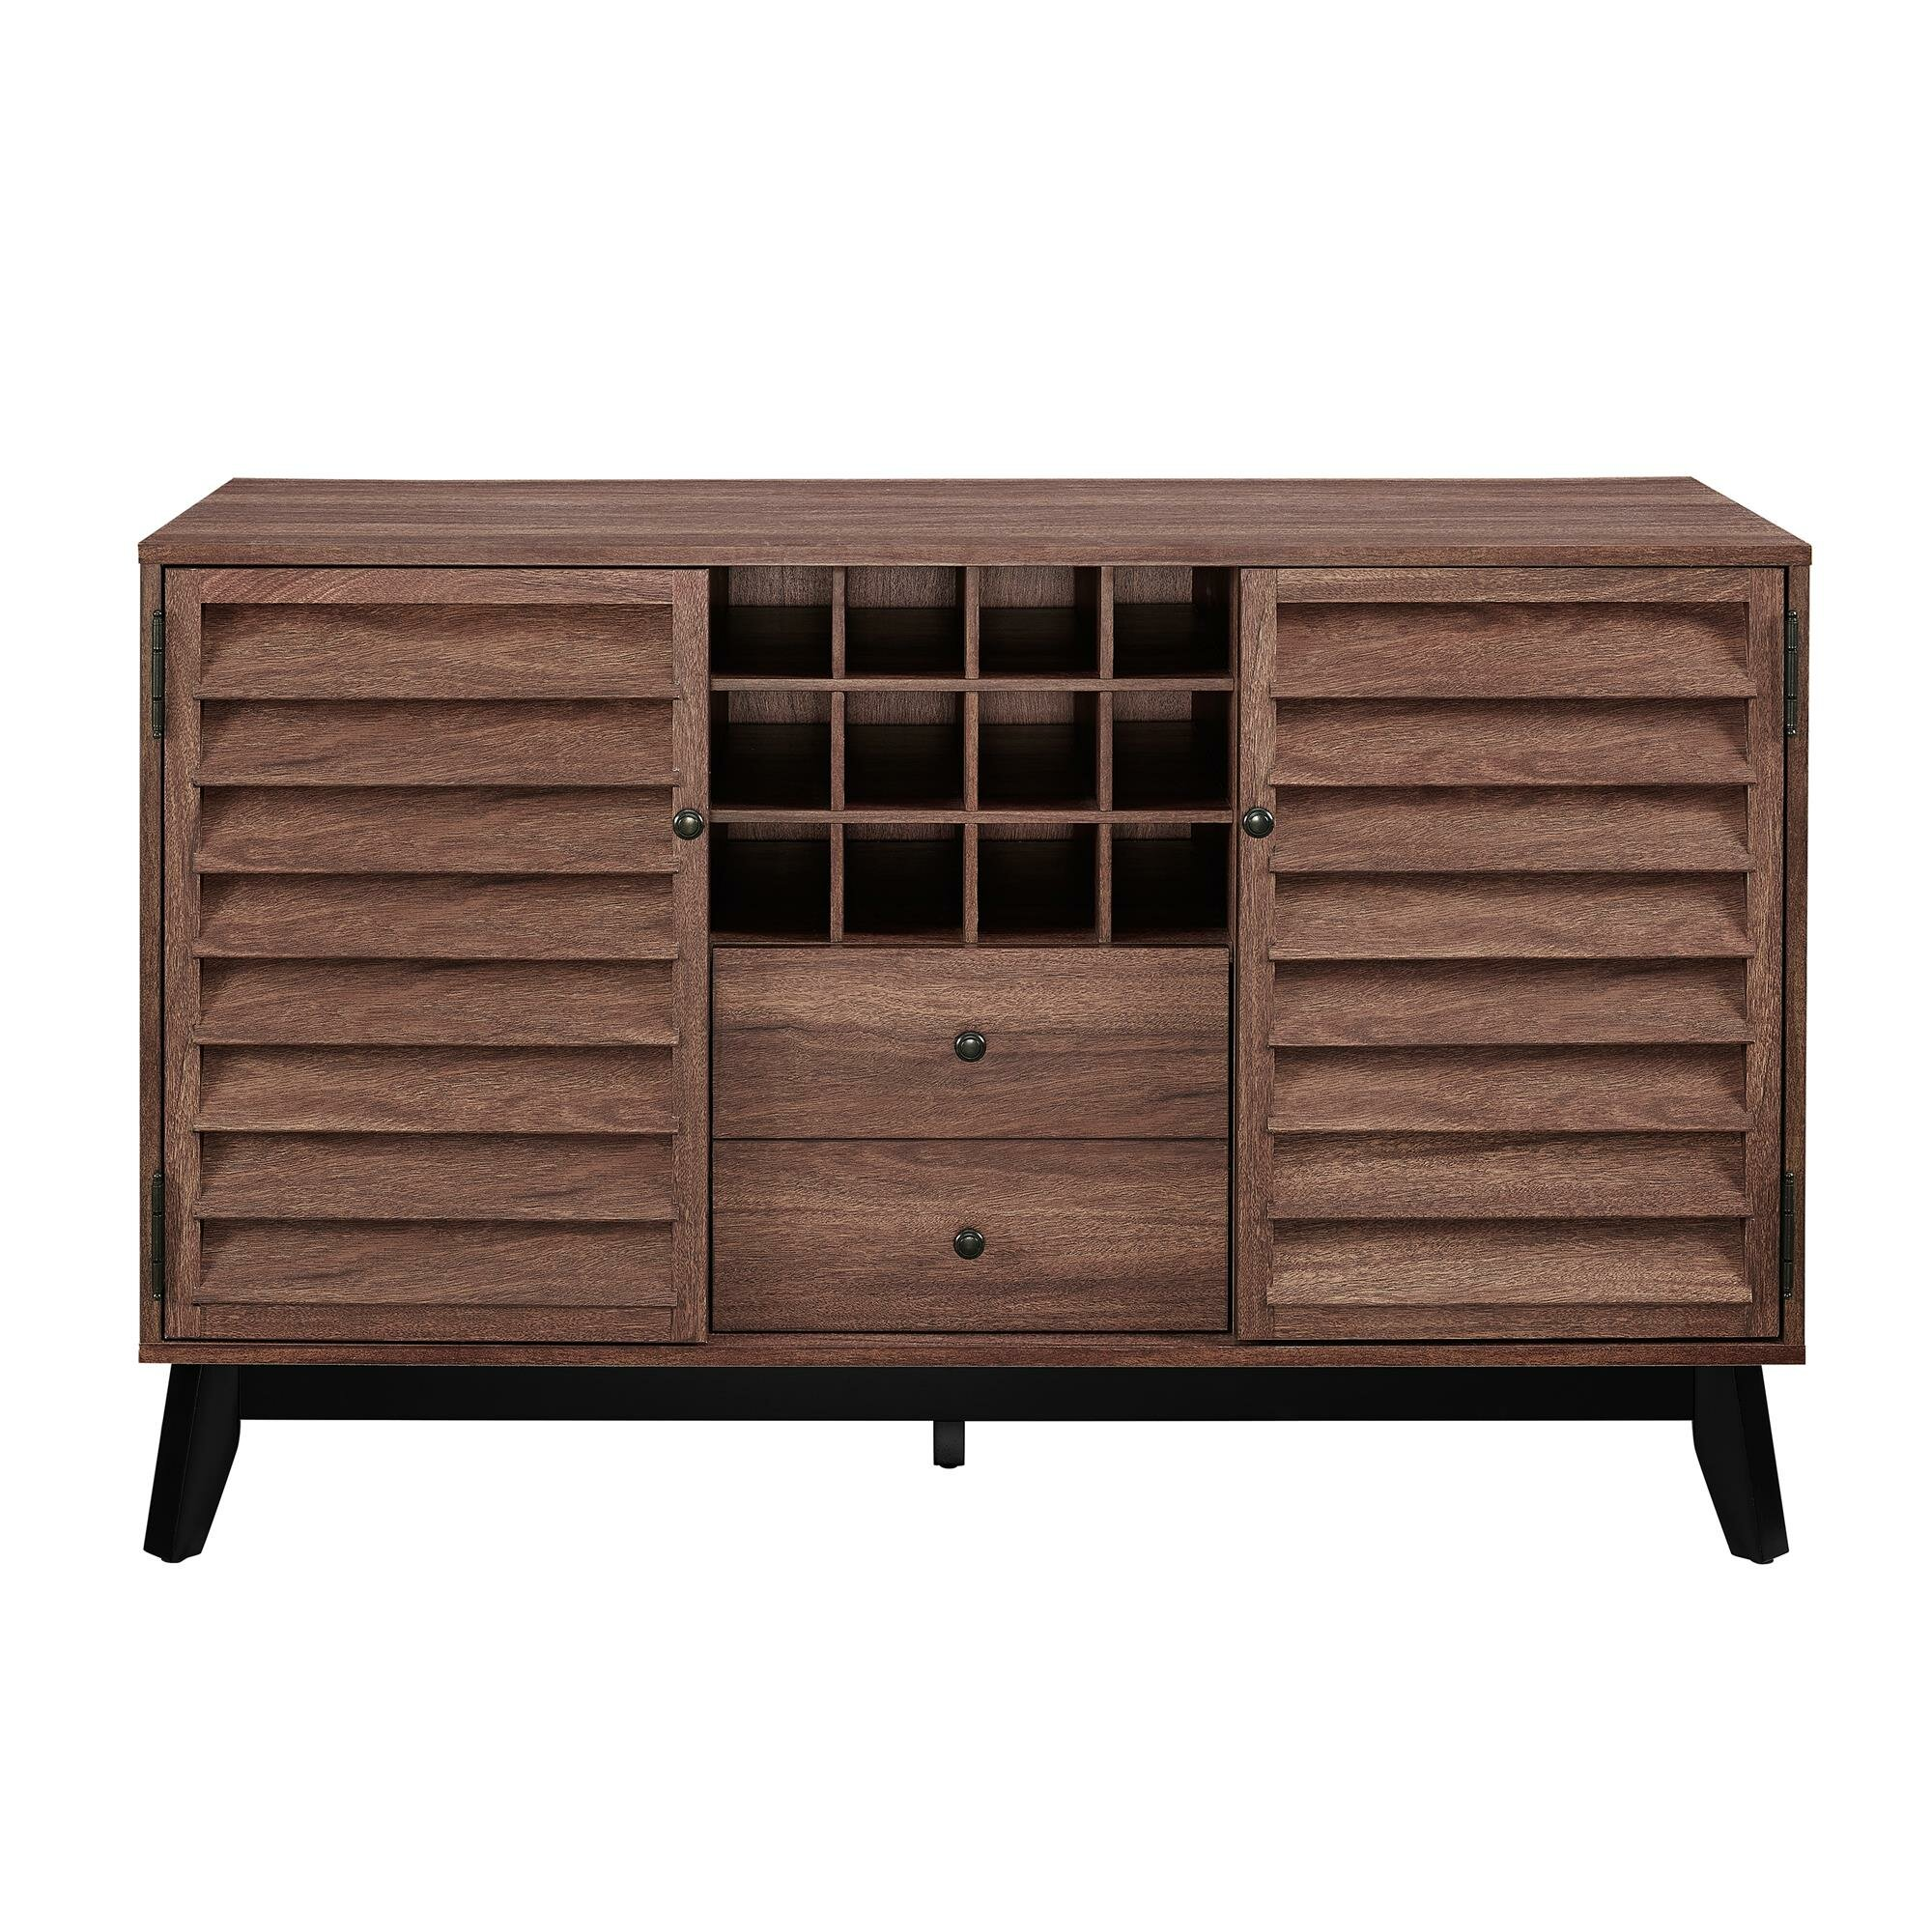 Peachy Modern Wine Bar Cabinets Allmodern Download Free Architecture Designs Salvmadebymaigaardcom